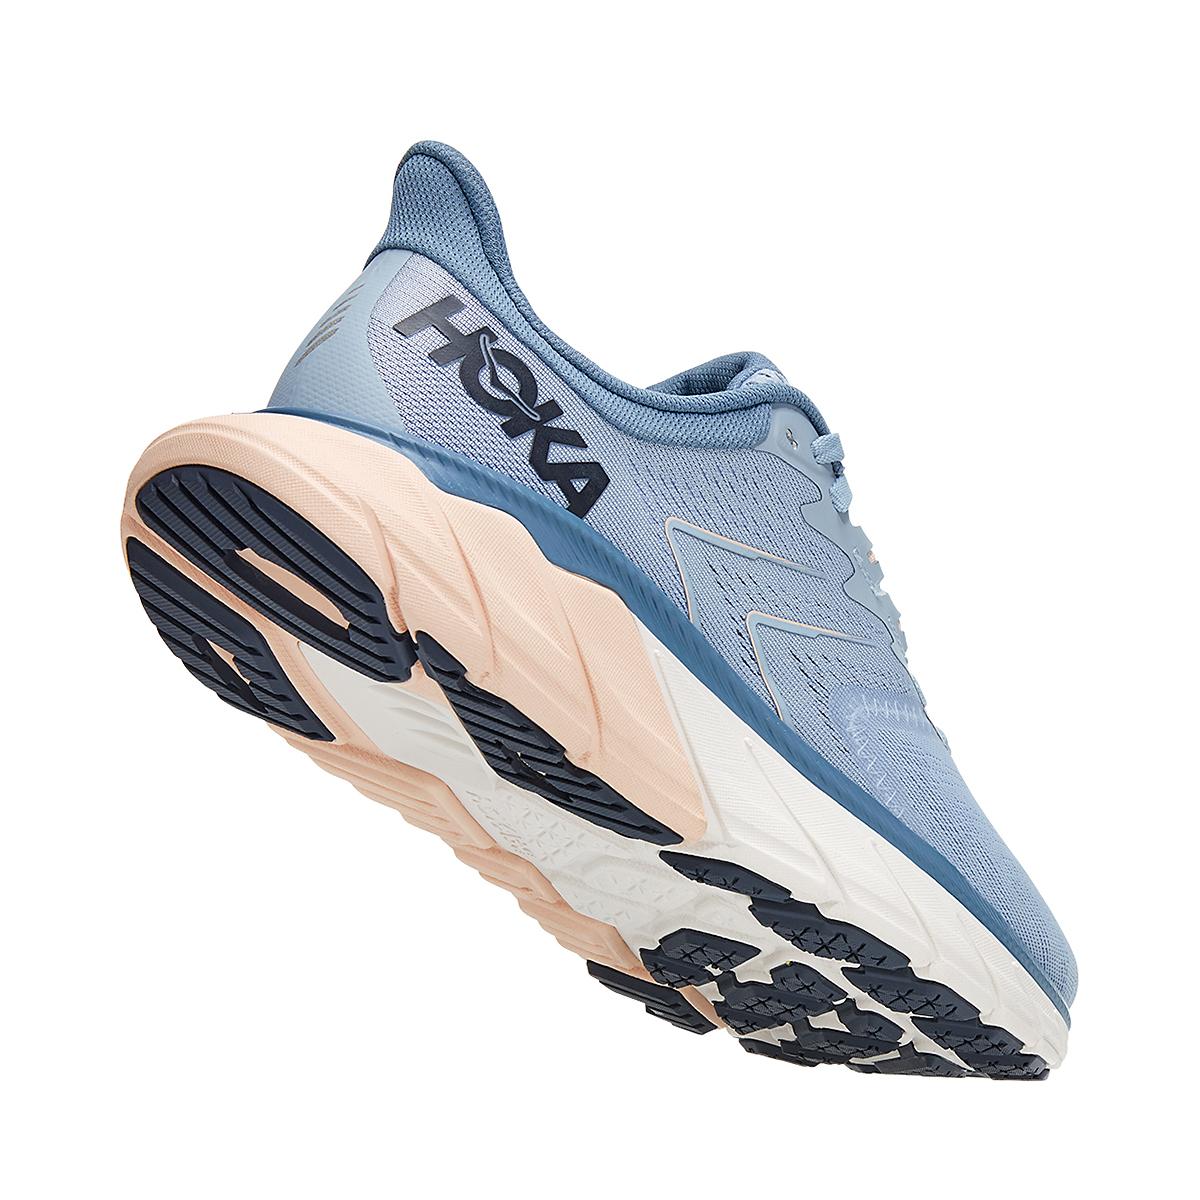 Women's Hoka One One Arahi 5 Running Shoe - Color: Blue Fog/Provincial Blue - Size: 5 - Width: Regular, Blue Fog/Provincial Blue, large, image 3